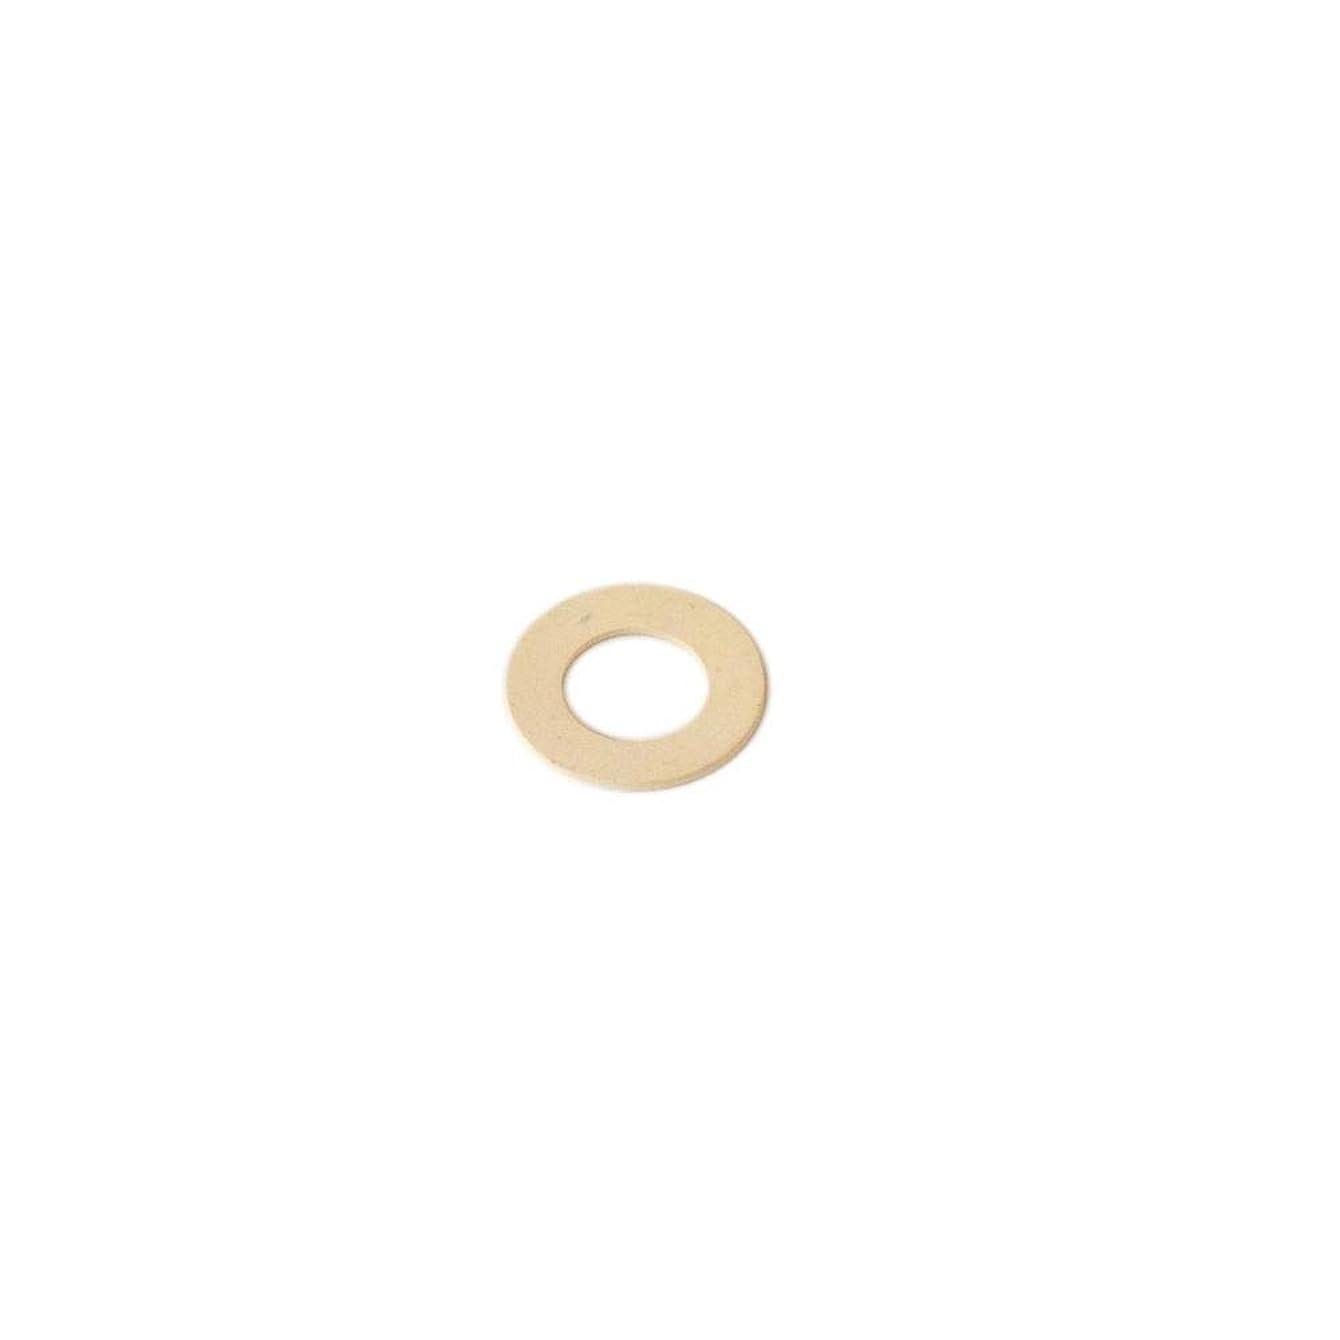 Lg 4H01029F Room Air Conditioner Drain Pipe Rubber Washer Genuine Original Equipment Manufacturer (OEM) Part